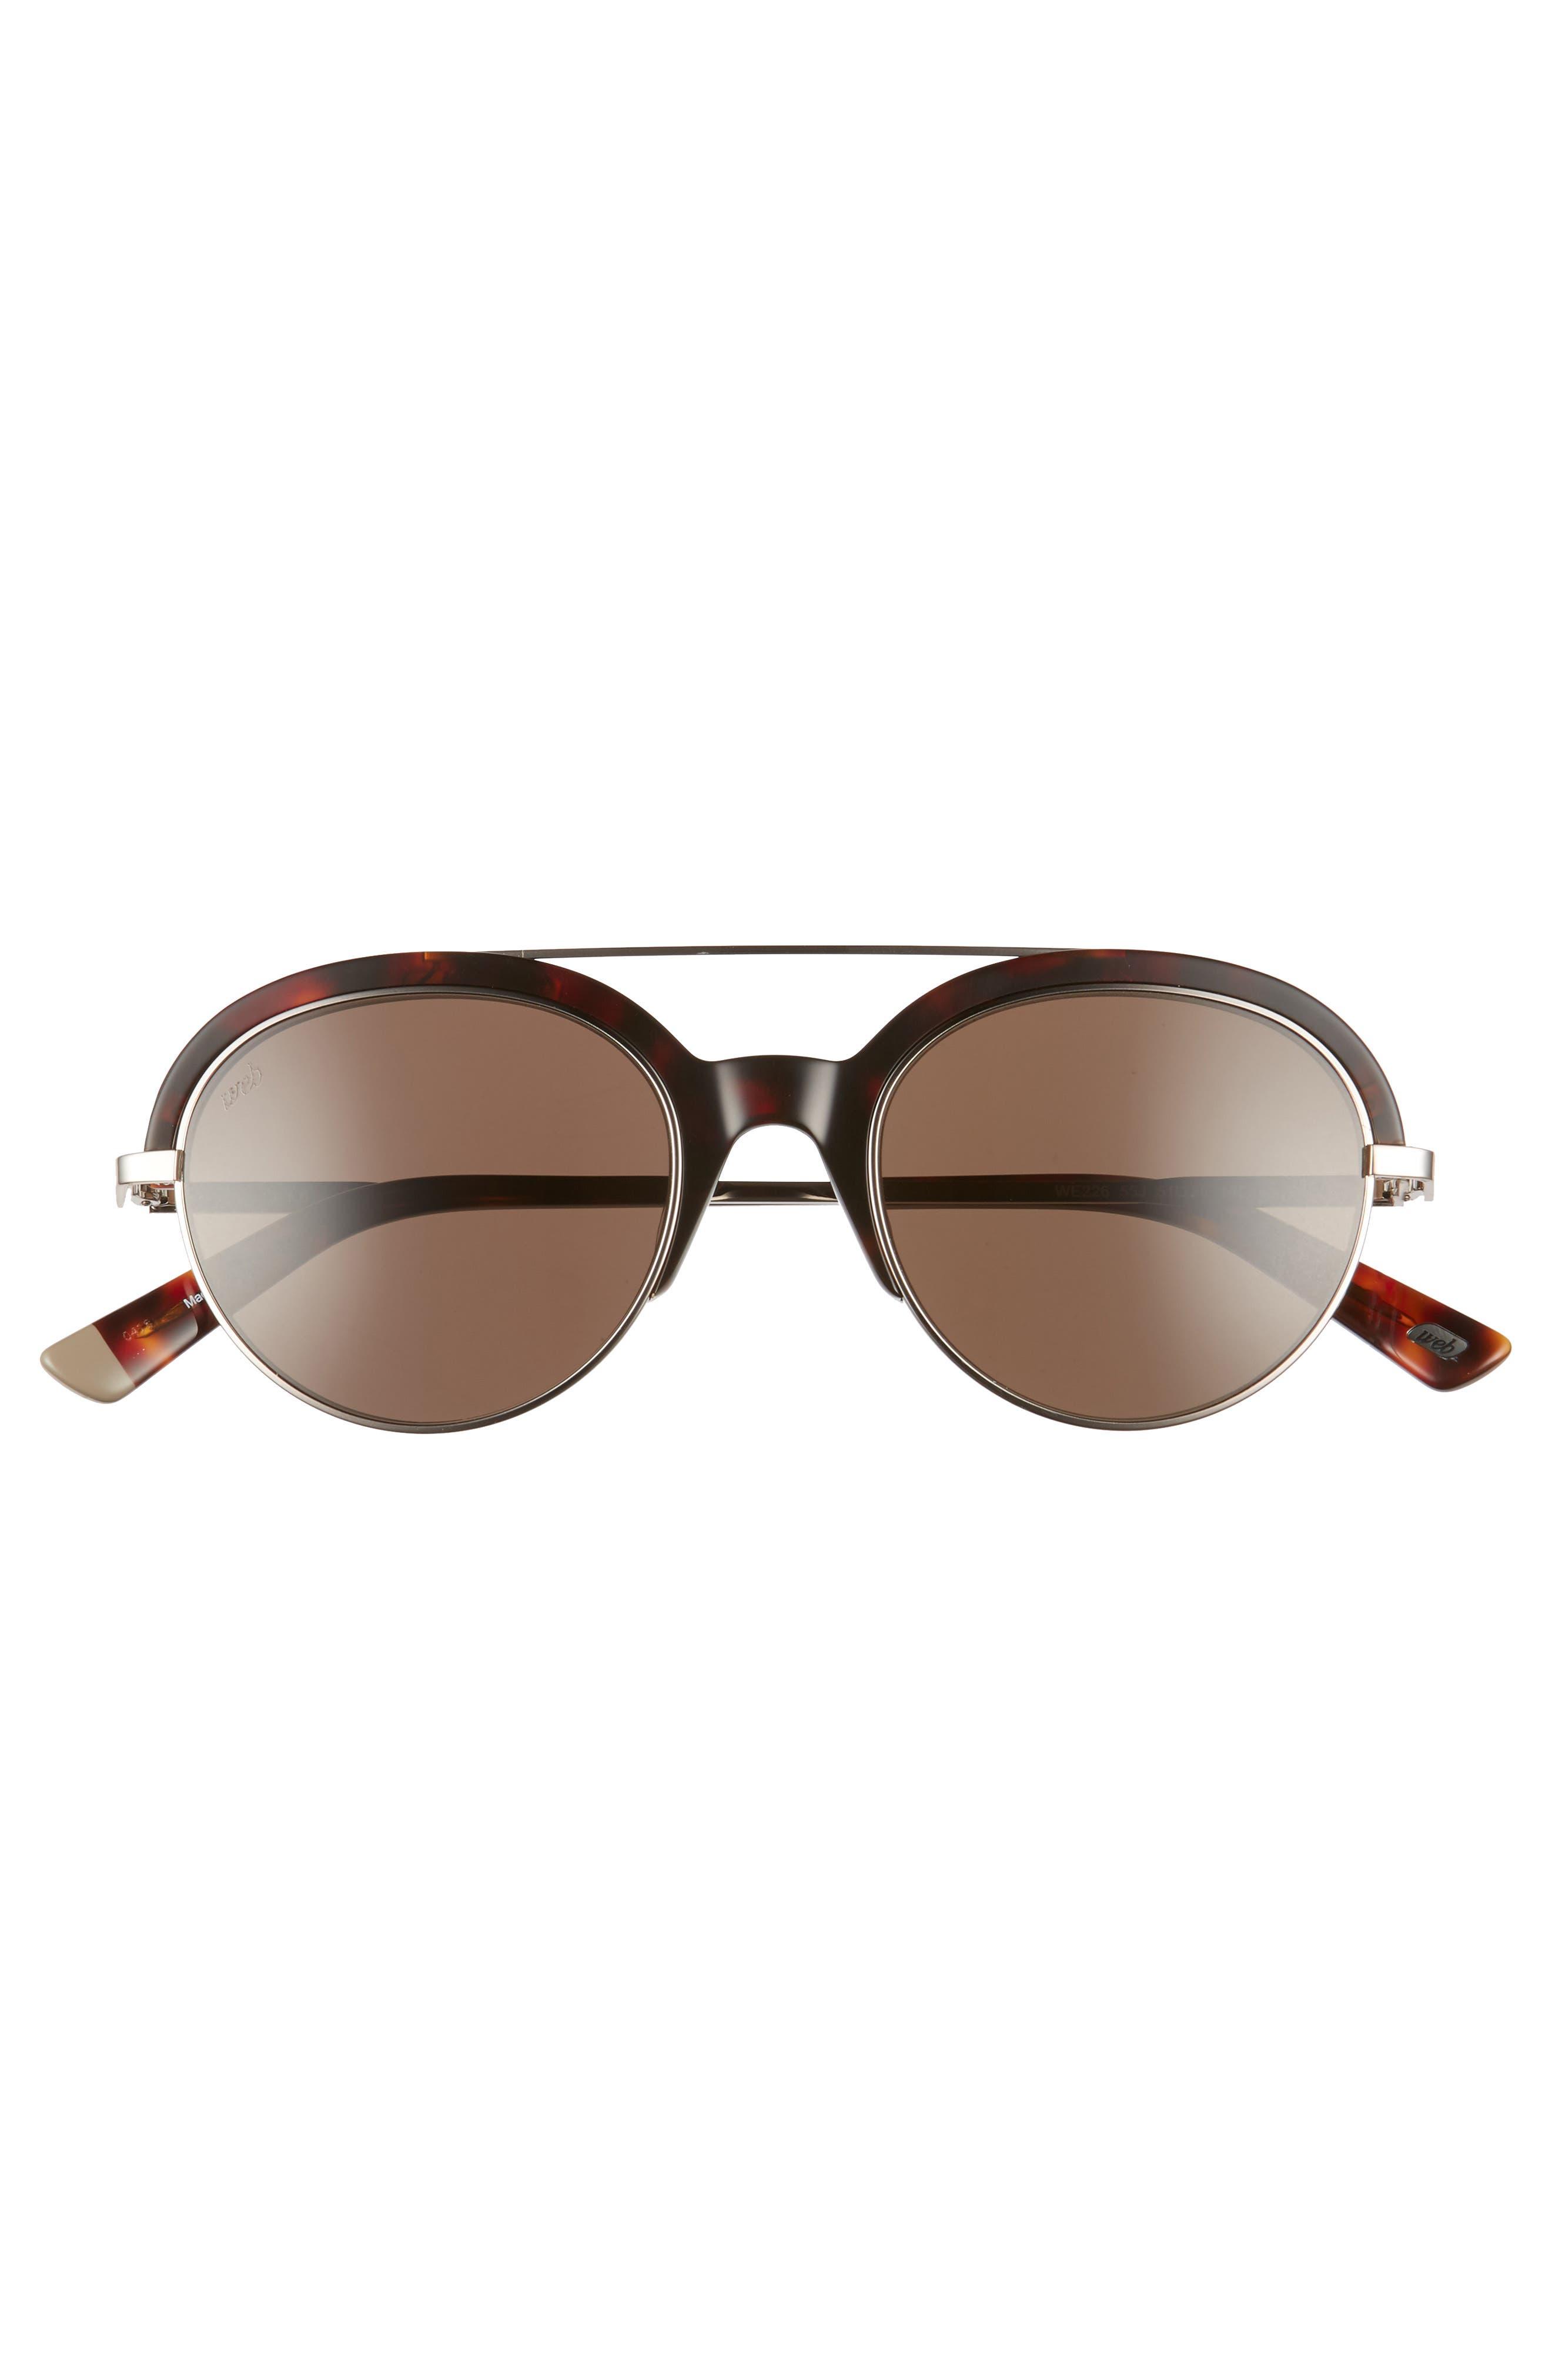 51mm Aviator Sunglasses,                             Alternate thumbnail 2, color,                             Colored Havana/ Roviex